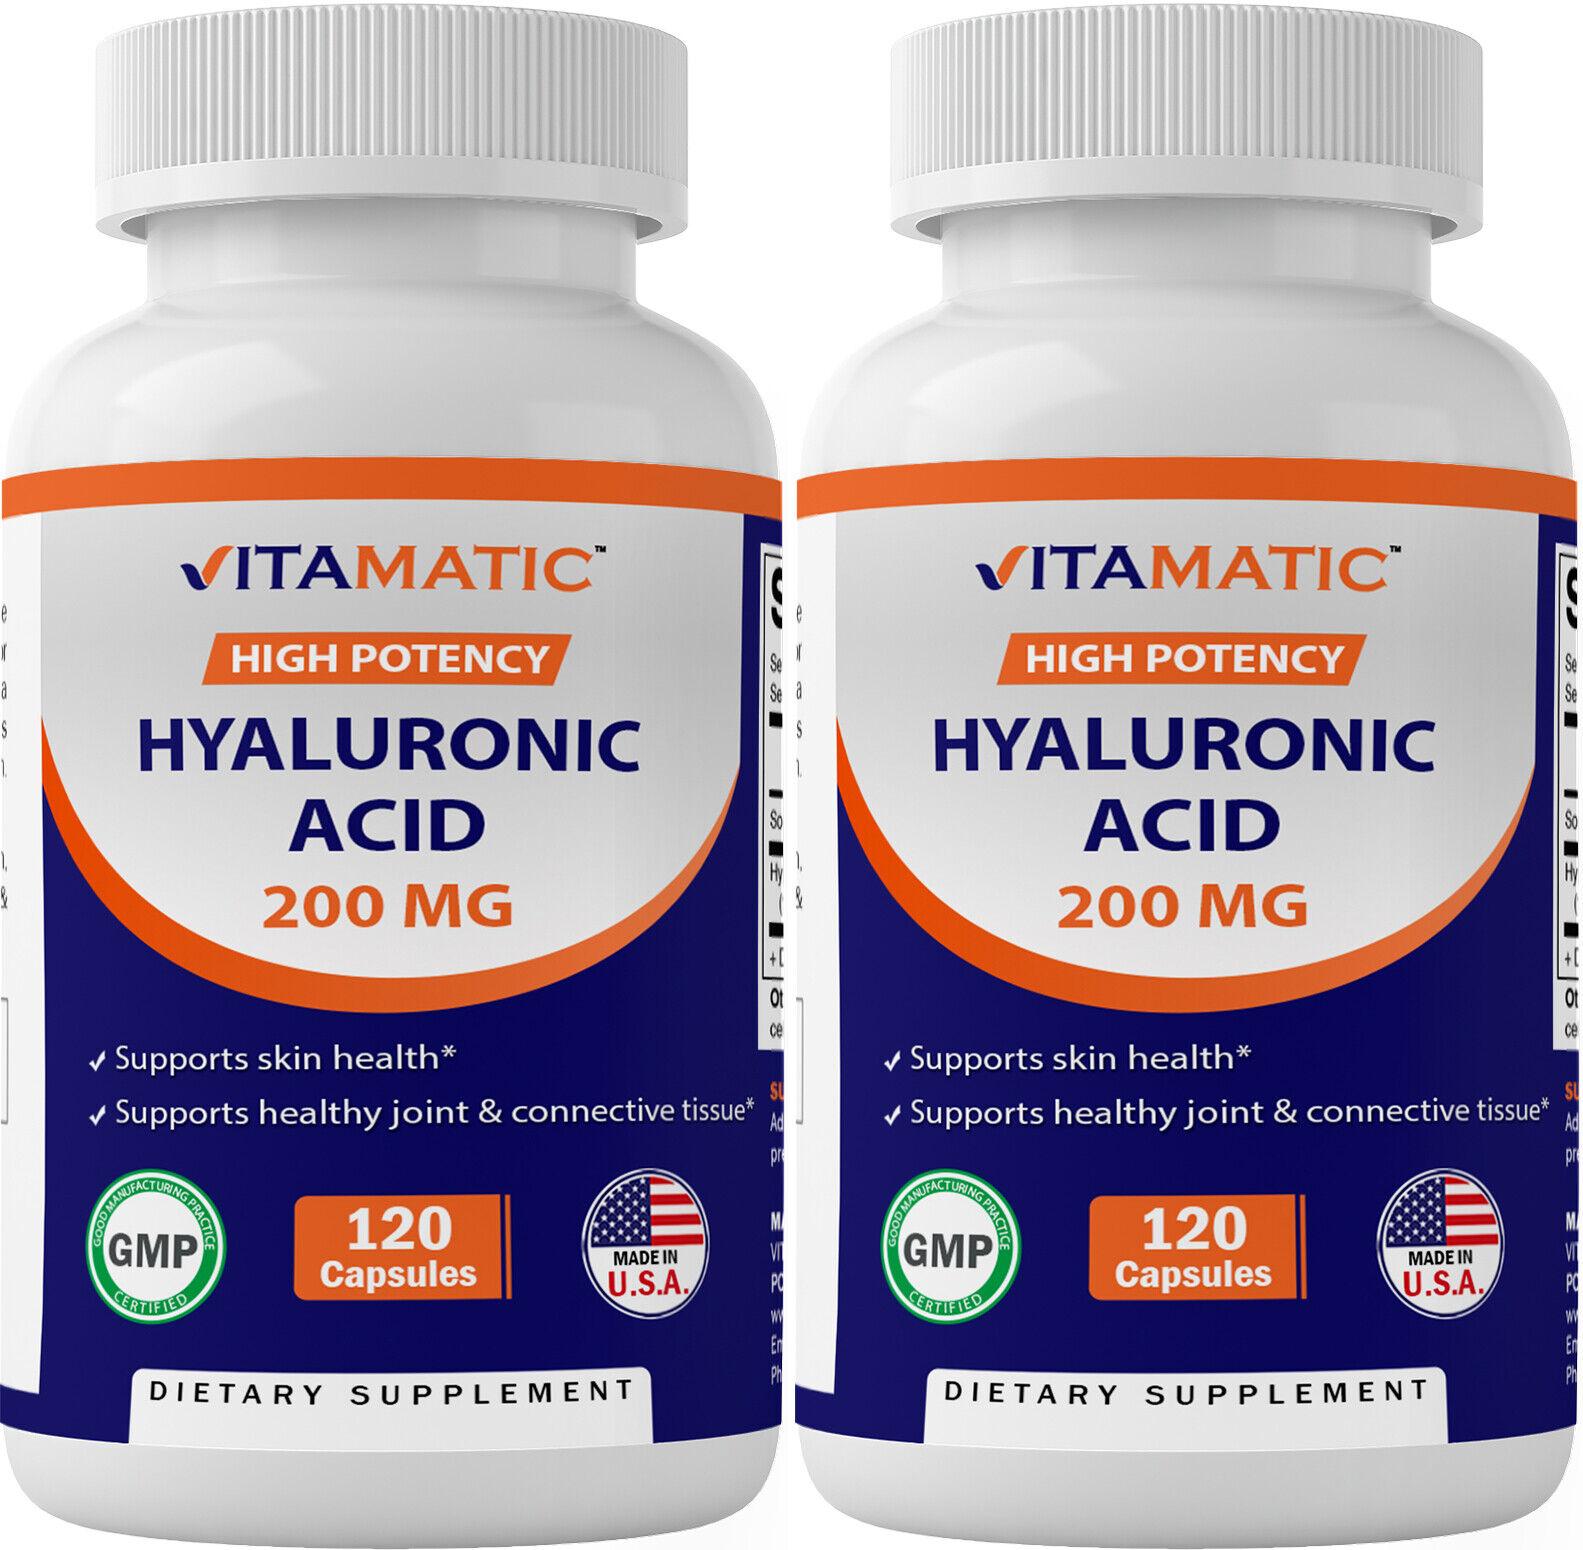 2 Pack - Vitamatic Hyaluronic Acid Supplements 200mg -240 capsules Healthy Skin